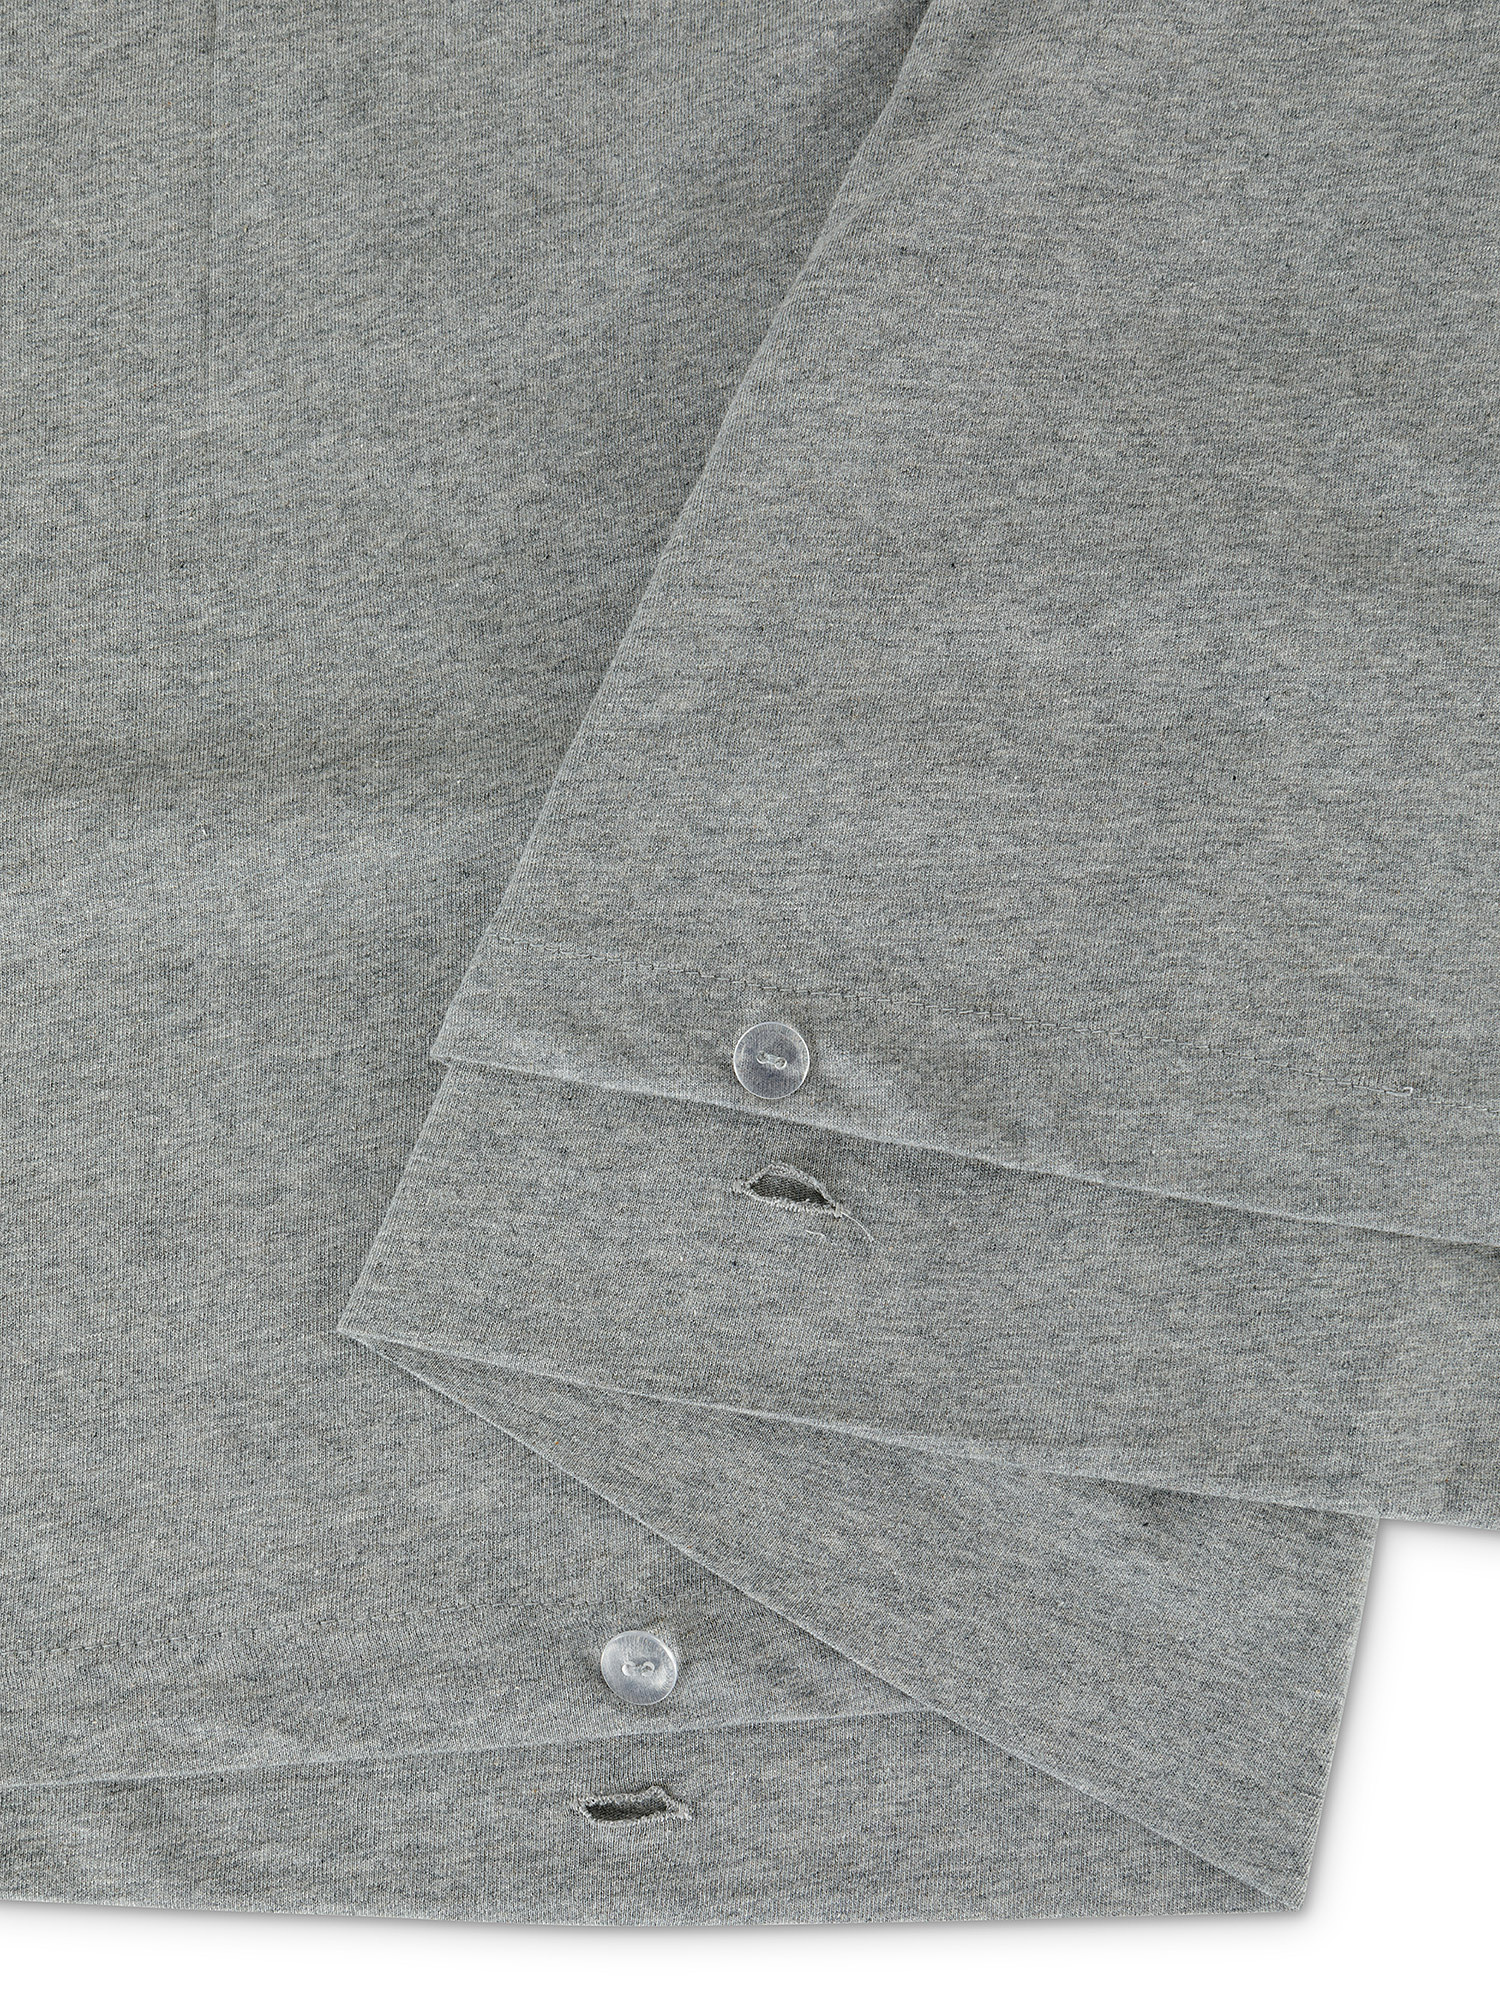 Parure copripiumino jersey di cotone tinta unita, Grigio, large image number 1